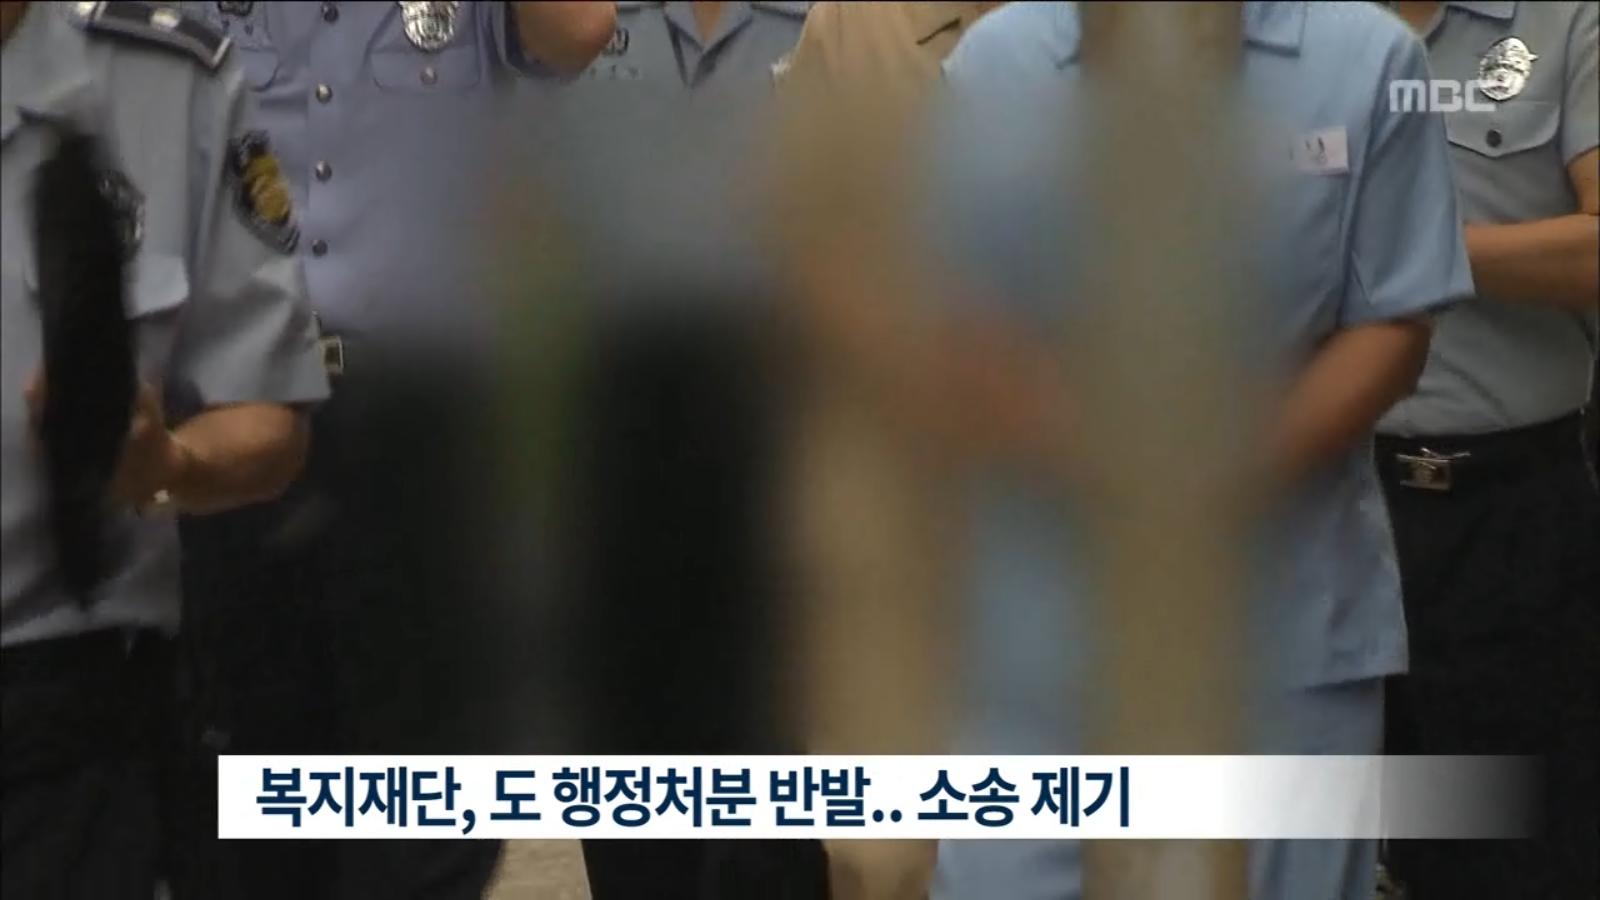 [15.5.19 MBC전주] 자림복지재단, 법인임원 직무정지.해임 처분에 반성은 커녕 소송제기2.jpg